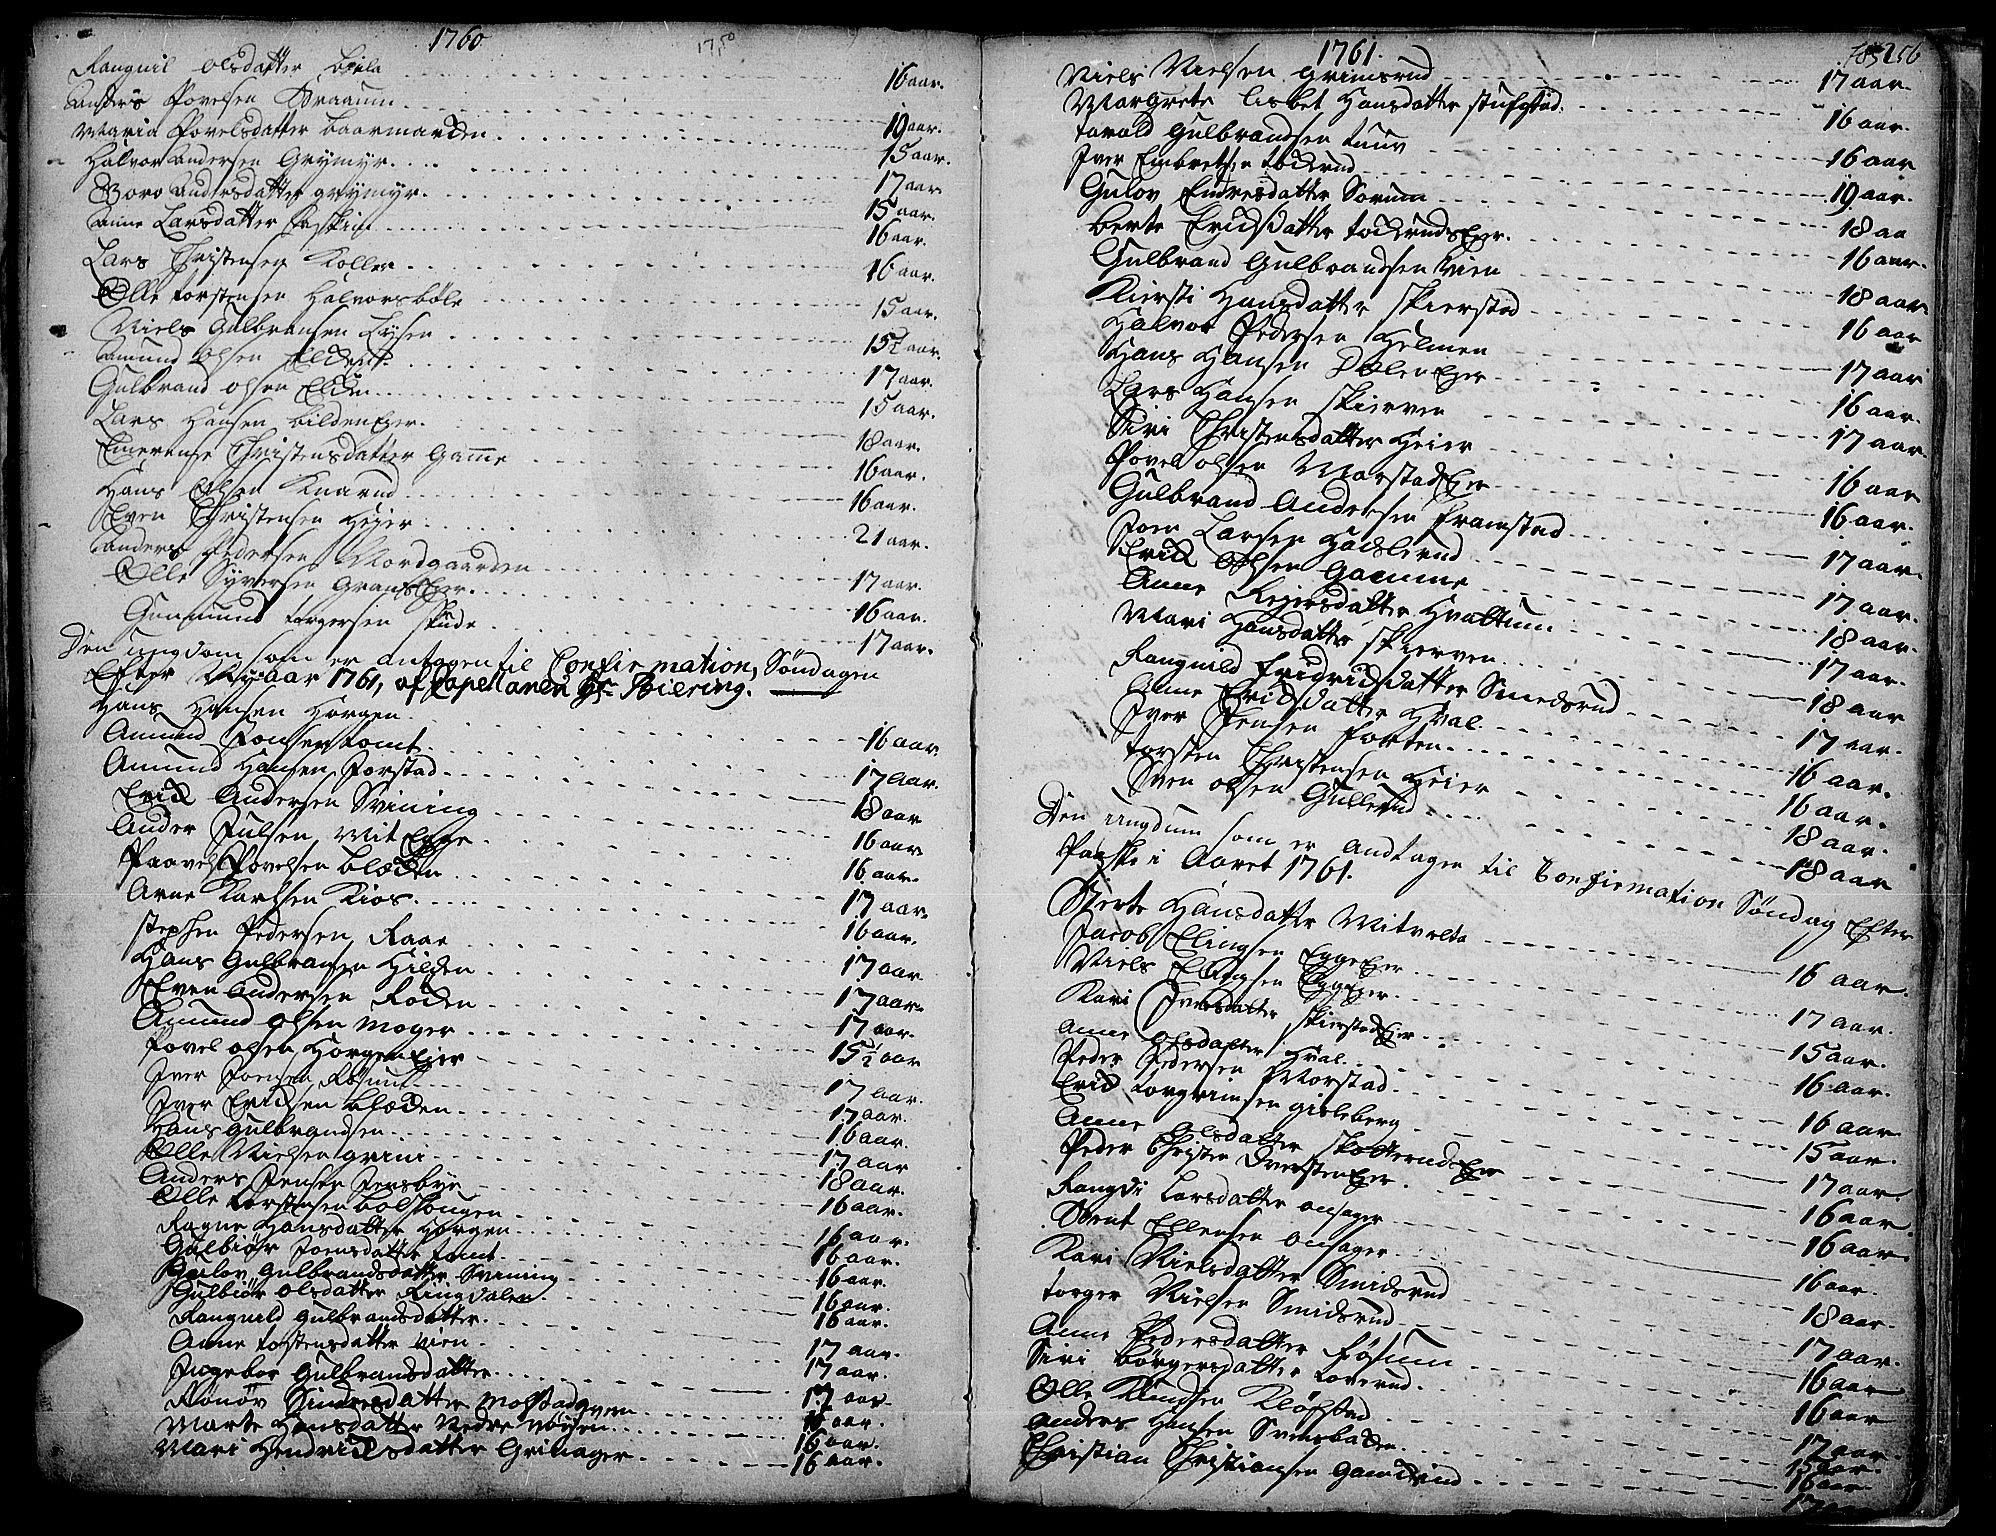 SAH, Gran prestekontor, Ministerialbok nr. 4, 1759-1775, s. 256